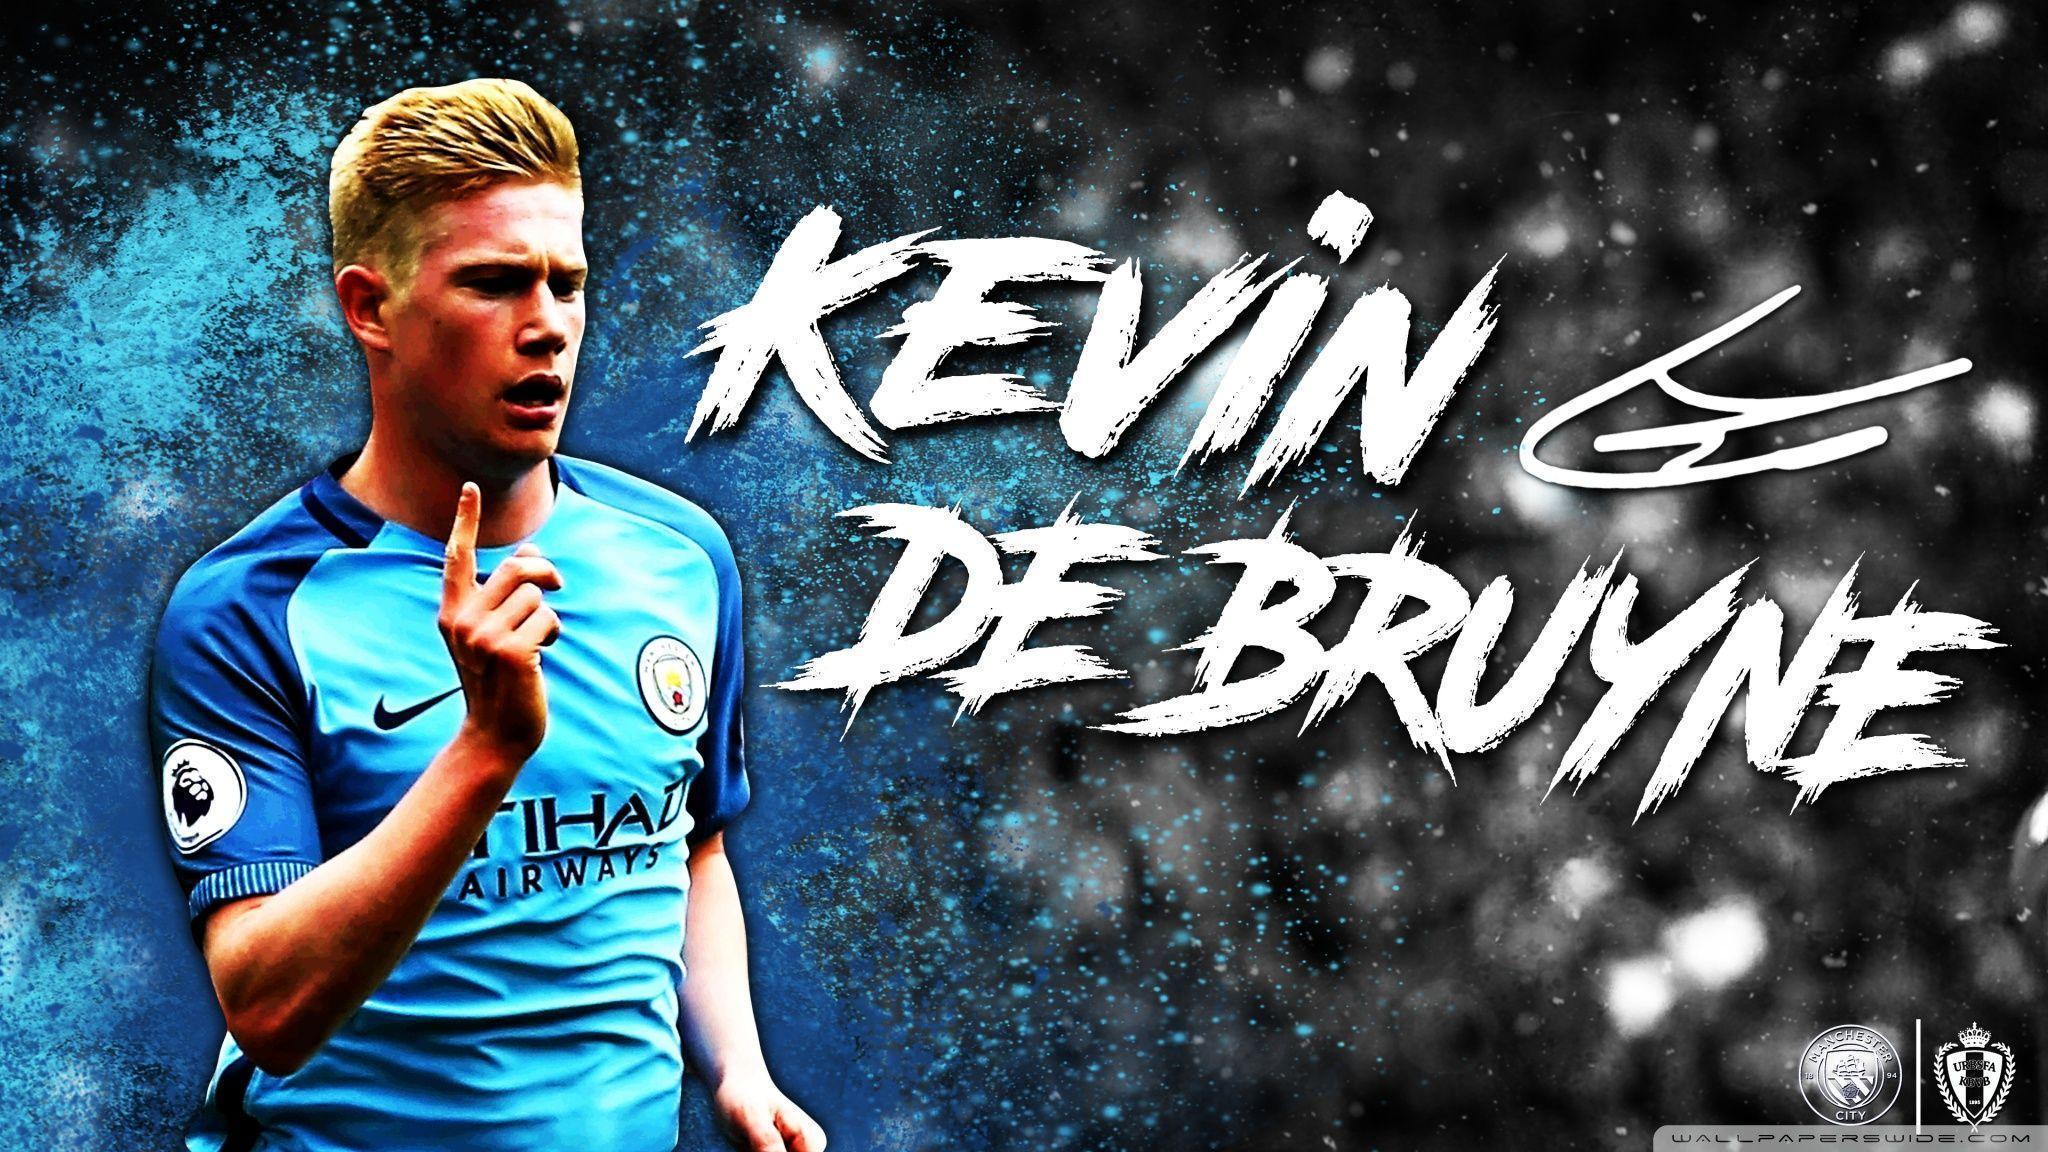 Kevin De Bruyne Wallpapers - Top Free Kevin De Bruyne ...